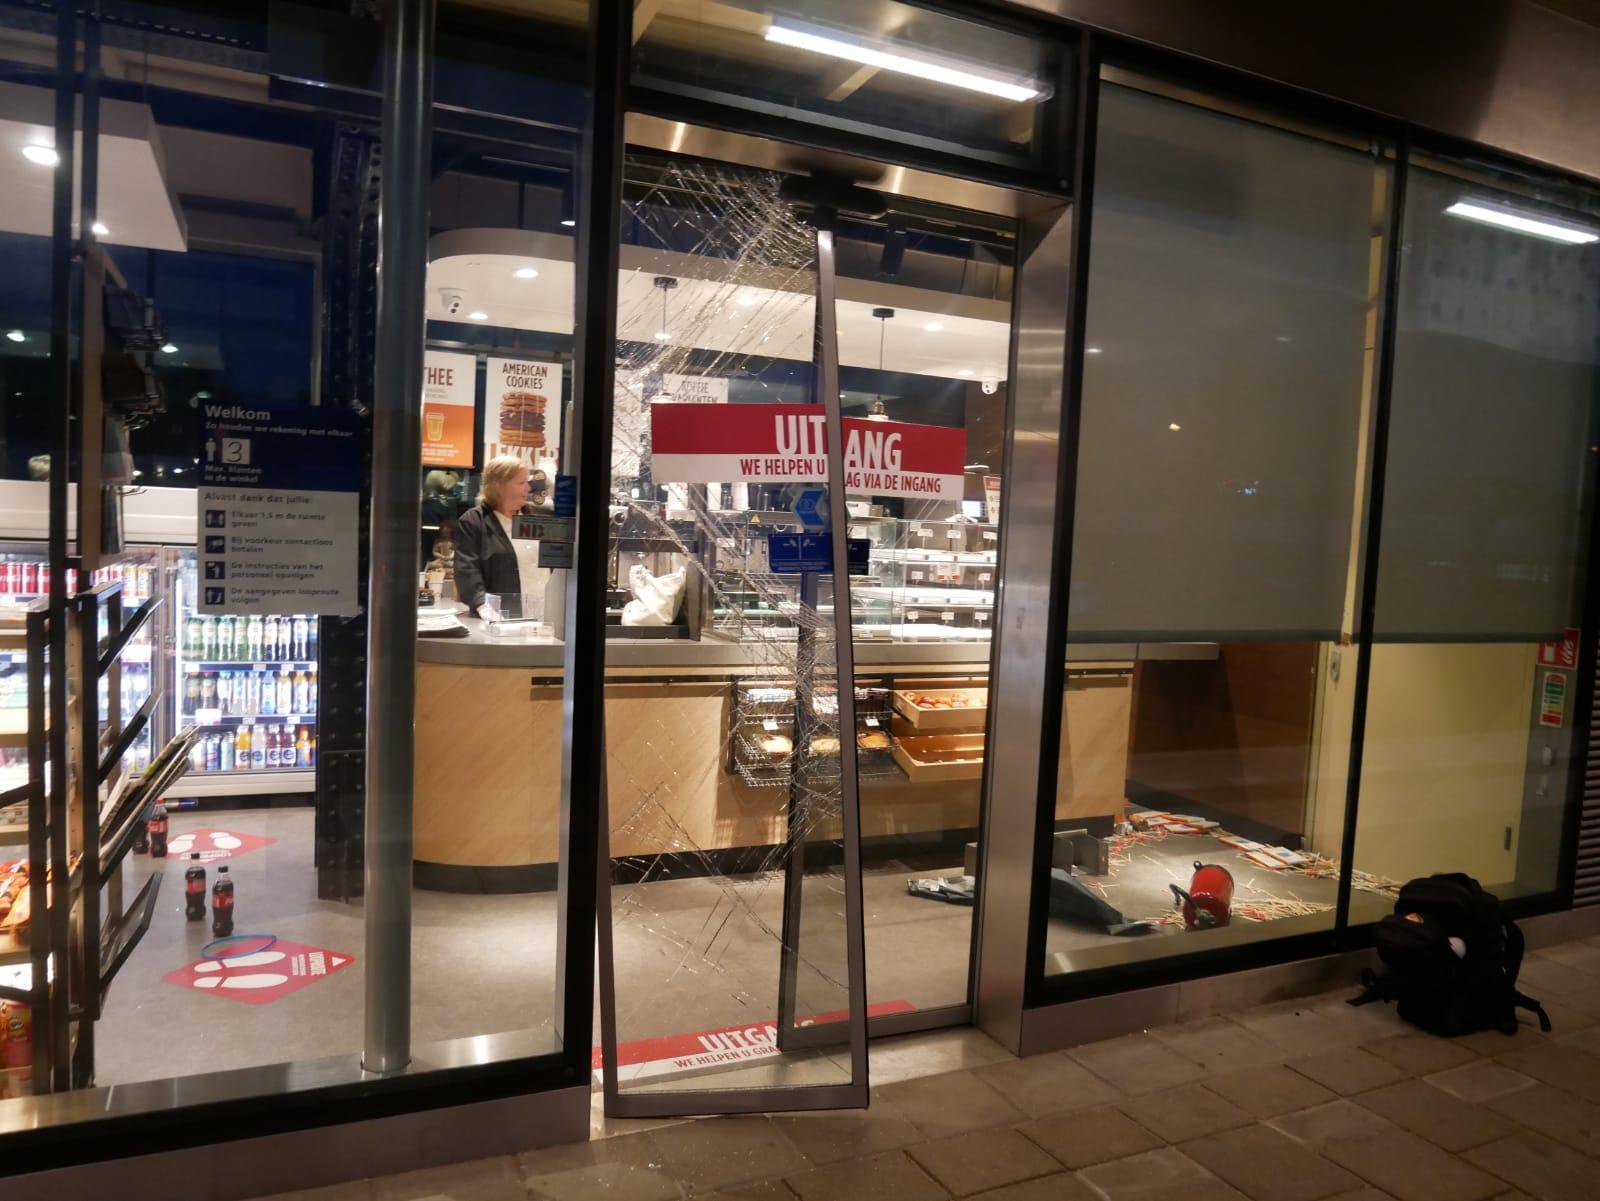 Inbrekers dringen Kiosk station Castricum binnen met brandblusser